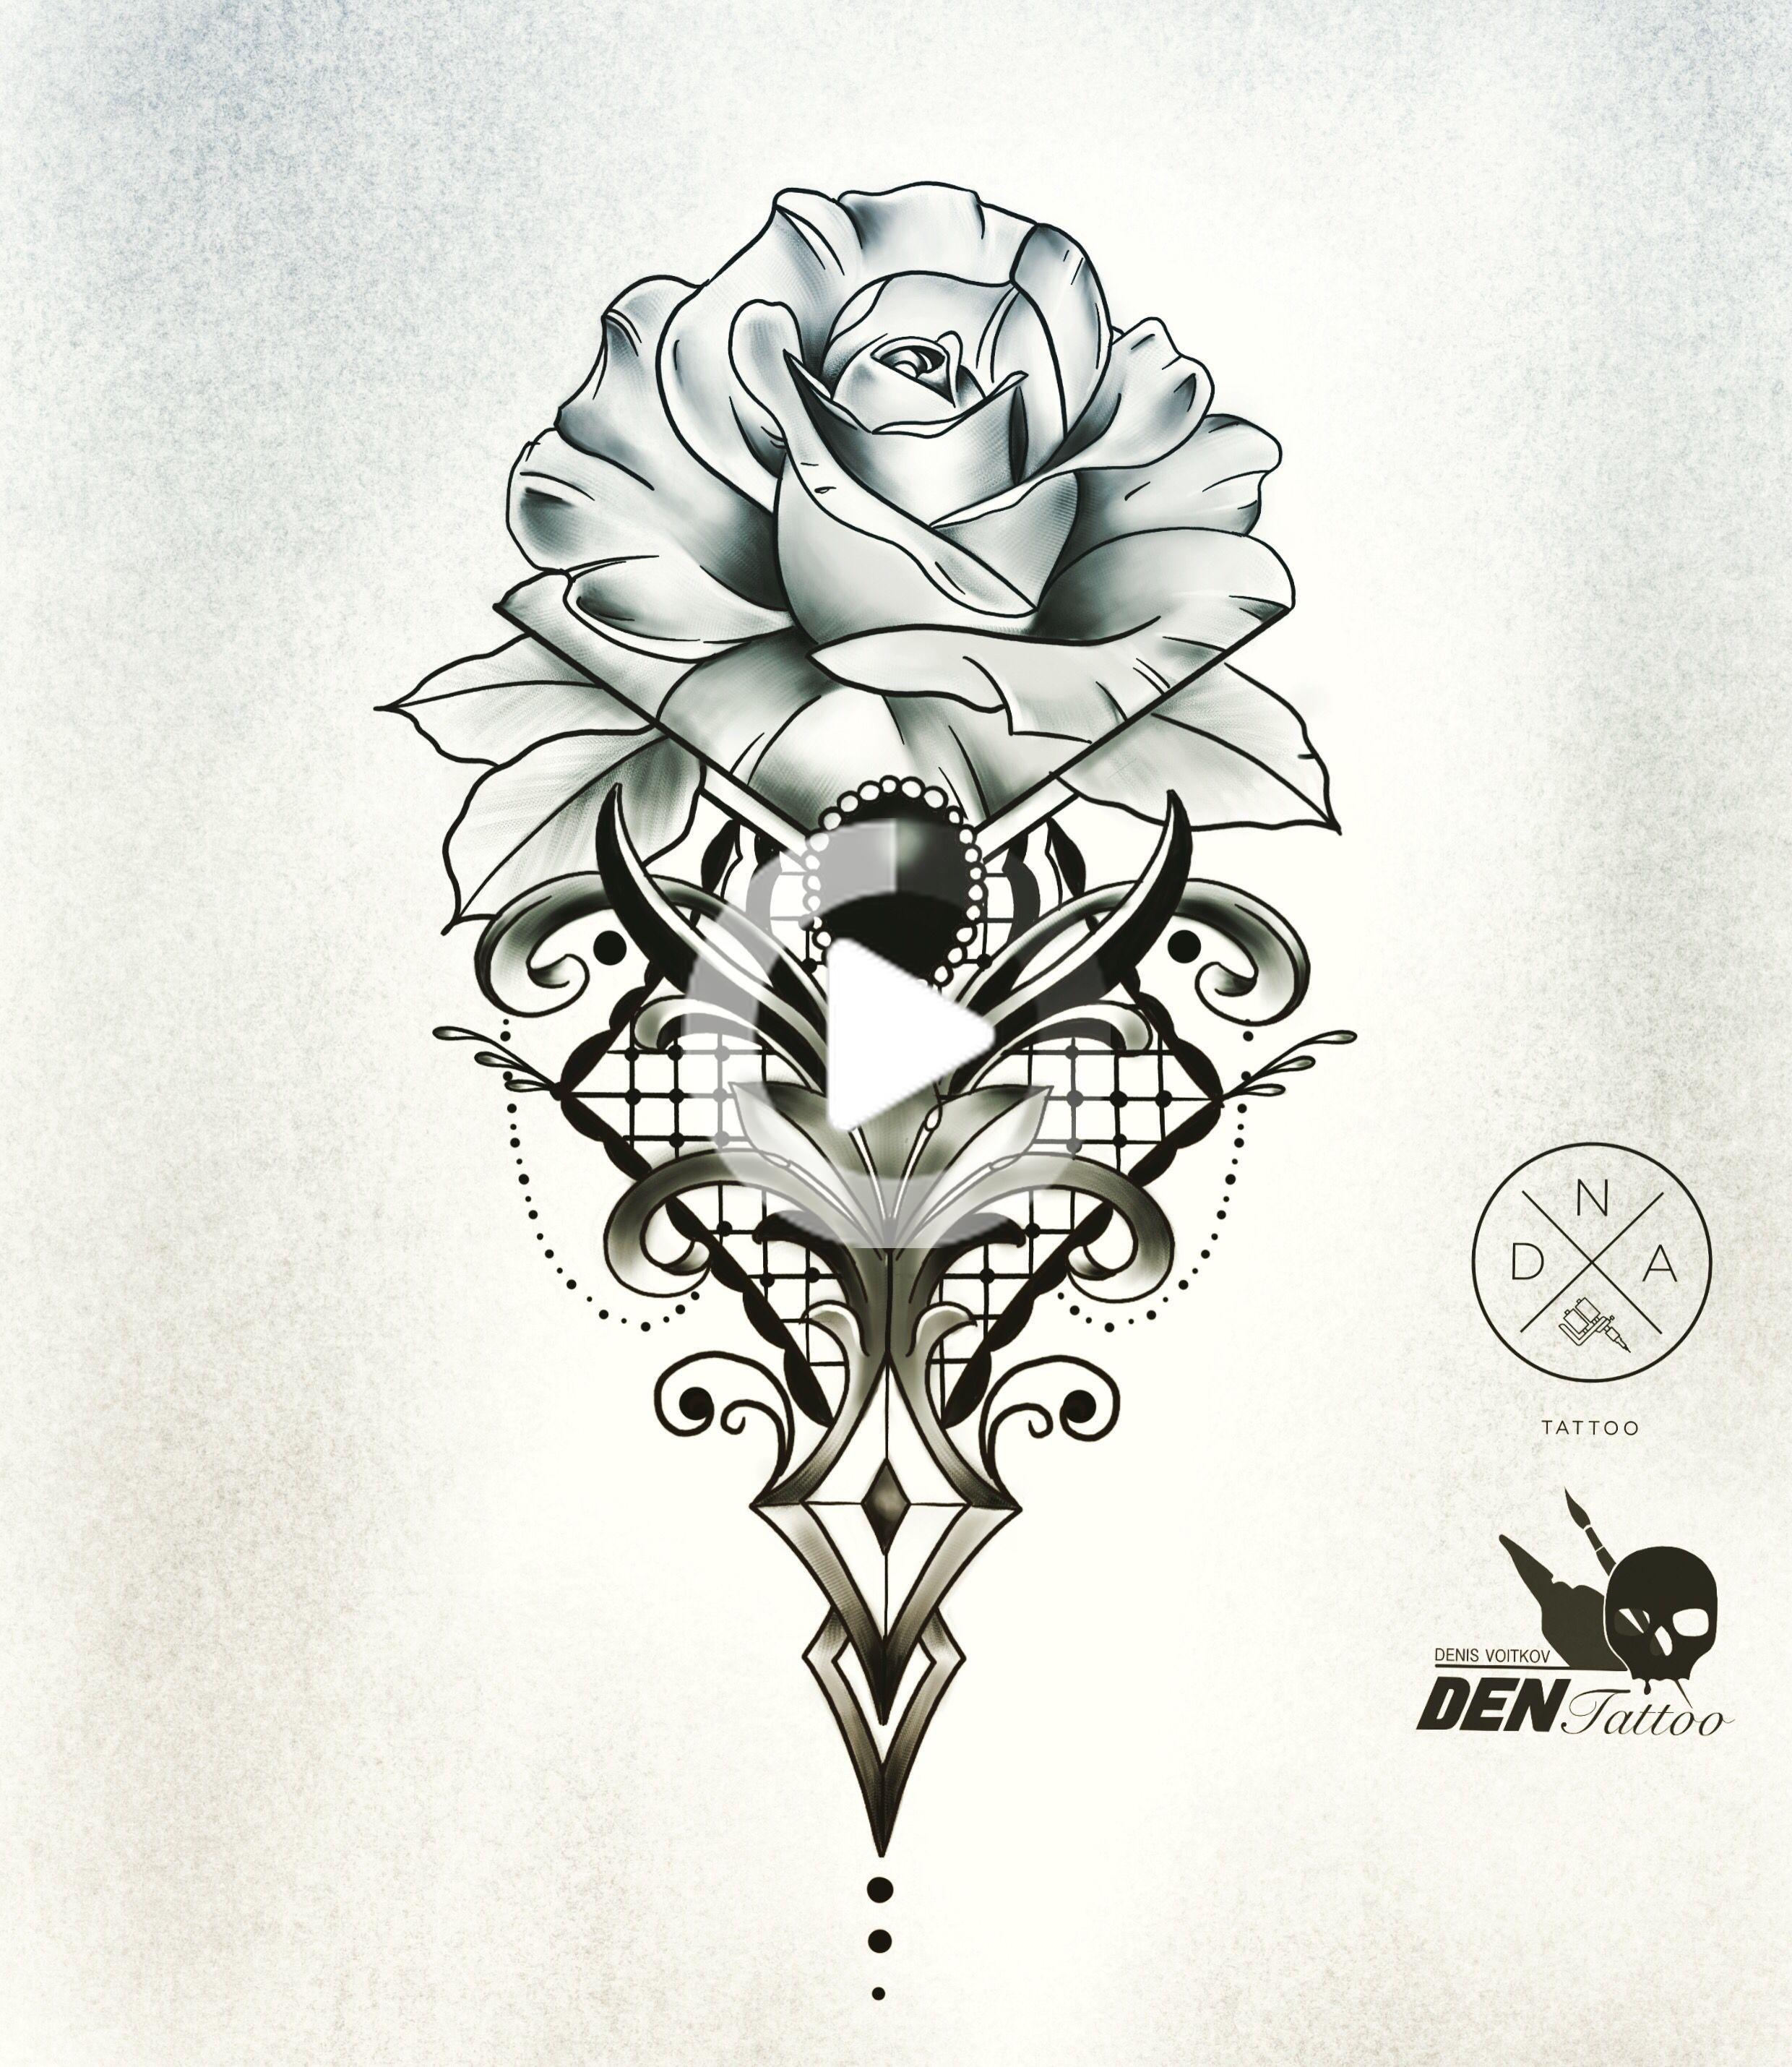 Tatuaze Gdansk Adn Tatouage Voitkov Tatouage Tattoo Gdansk Sleeve Tattoos Rose Tattoo Stencil Rose Tattoos